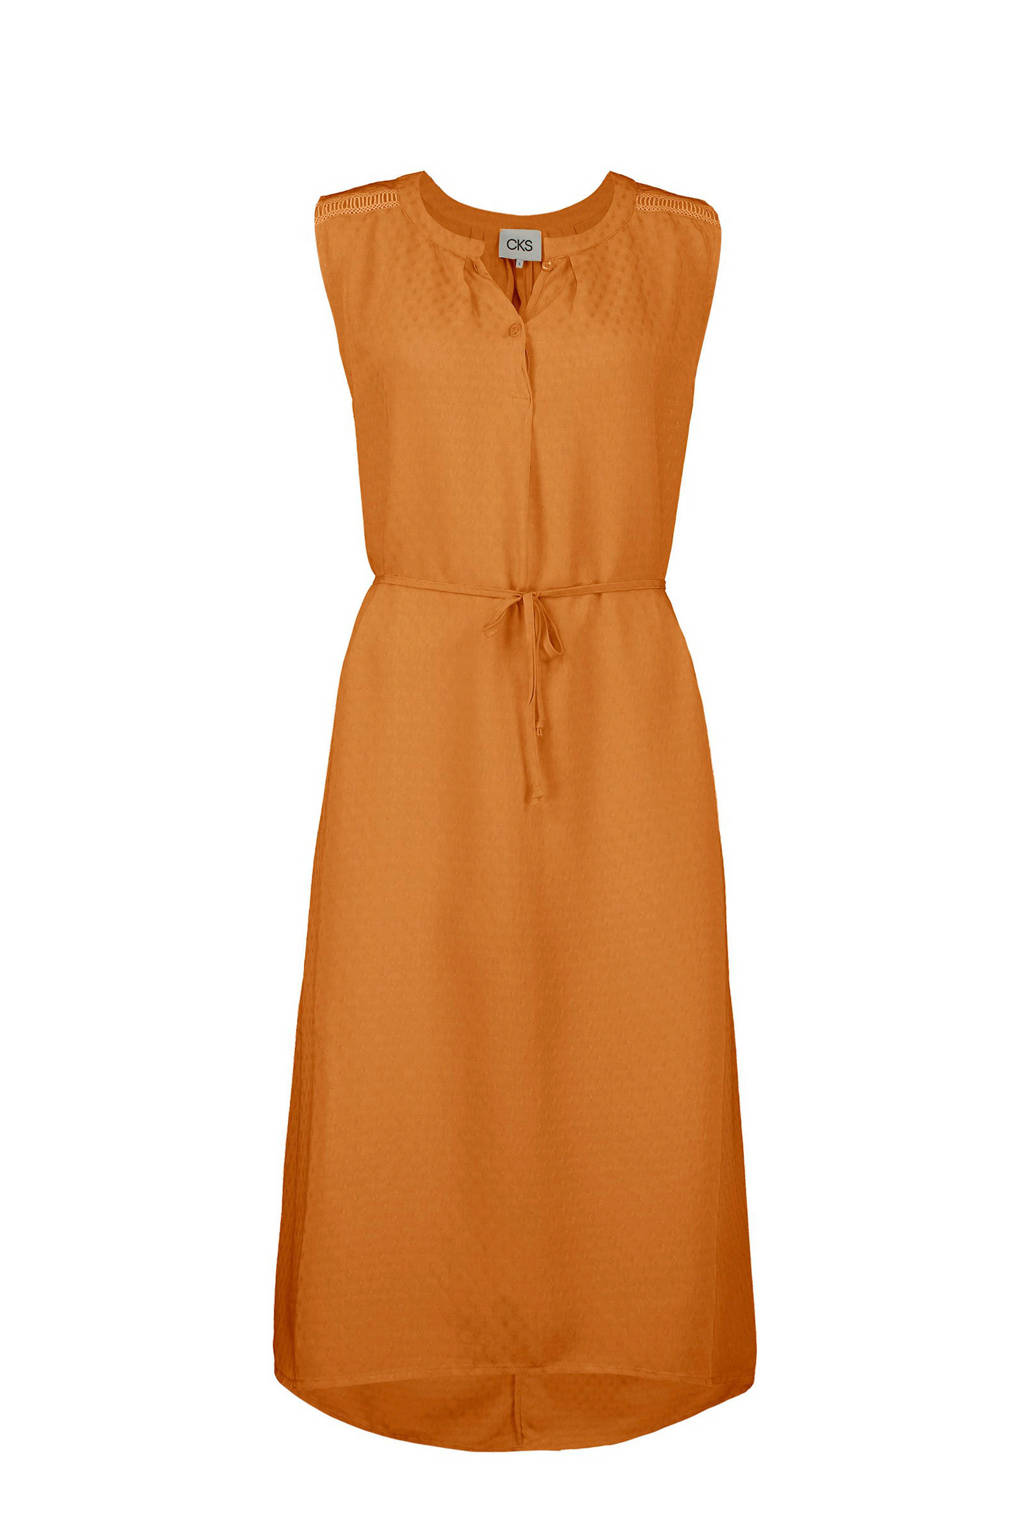 CKS jurk oranje, Cognac